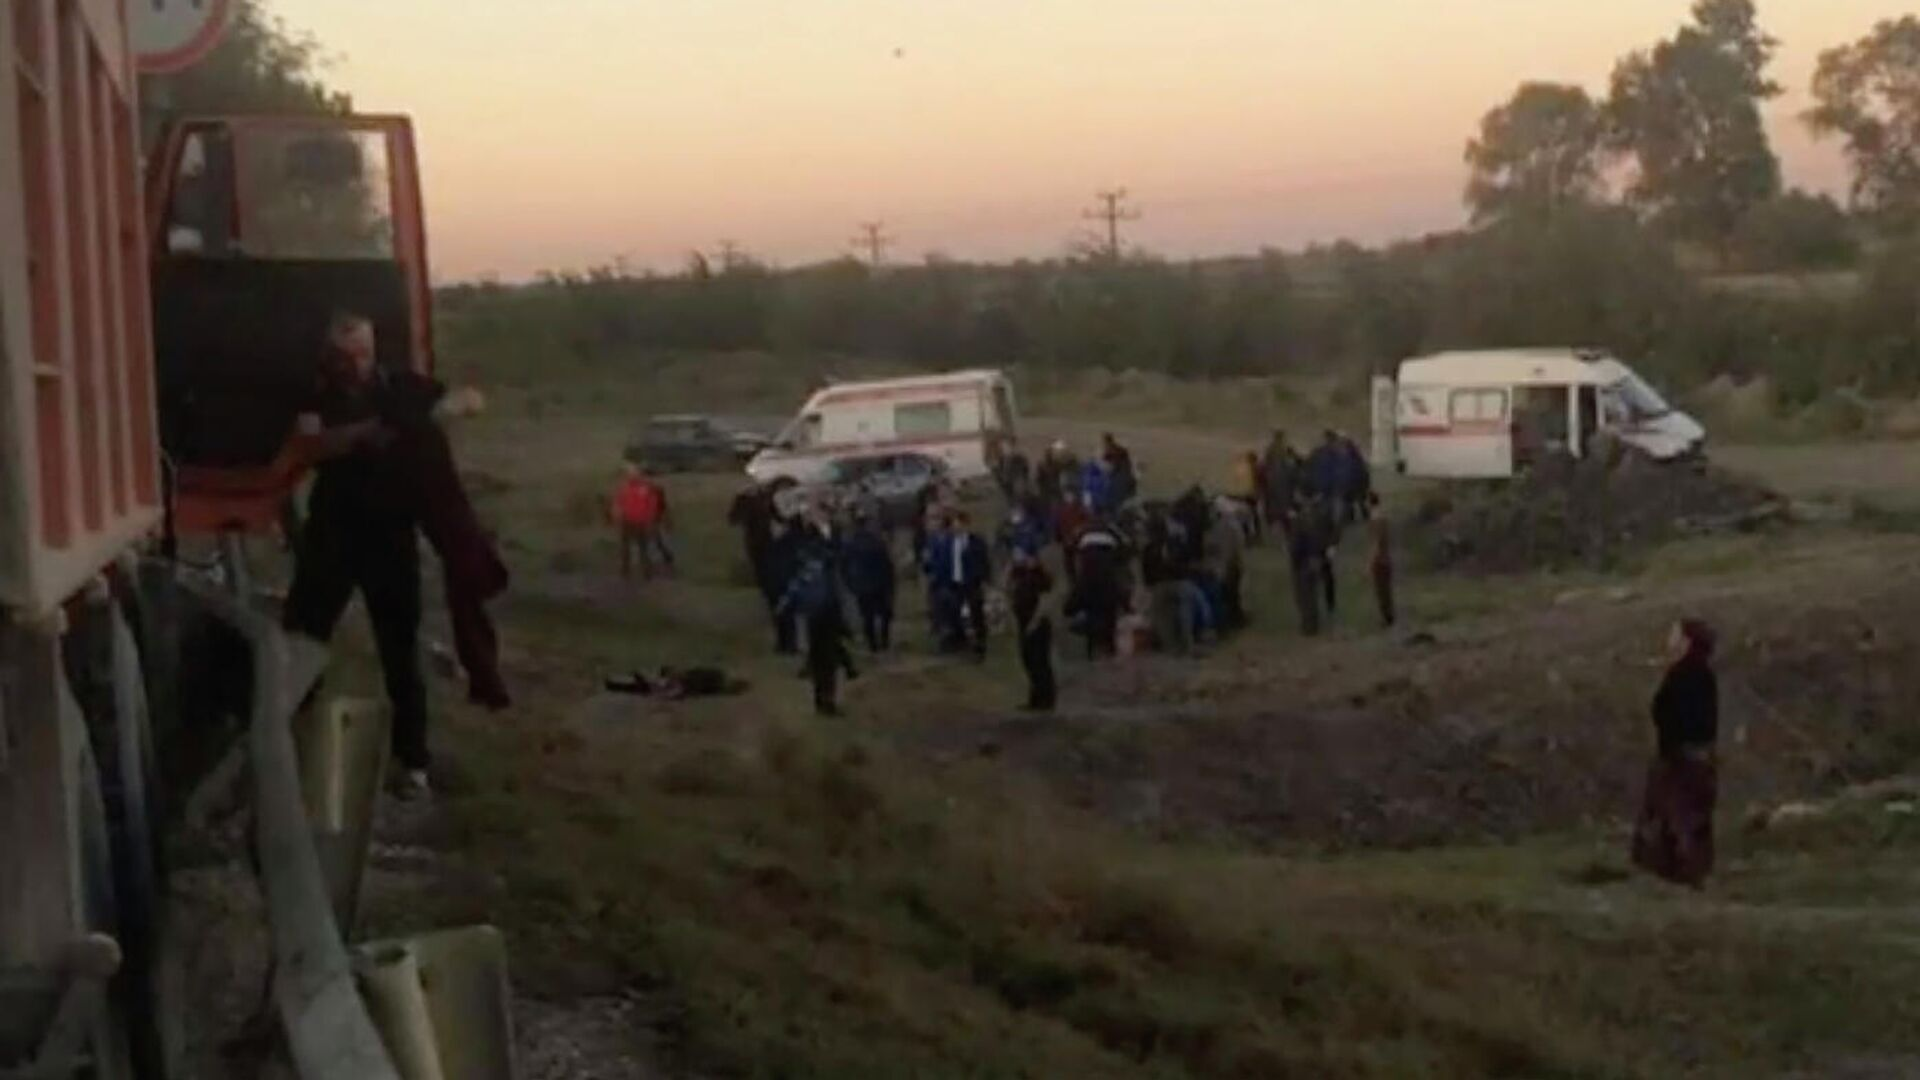 1578698177 0:133:1400:921 1920x0 80 0 0 7ea5a99ba2385694b7c83712be75a3db - В ДТП с автобусом в Дагестане погибли два человека